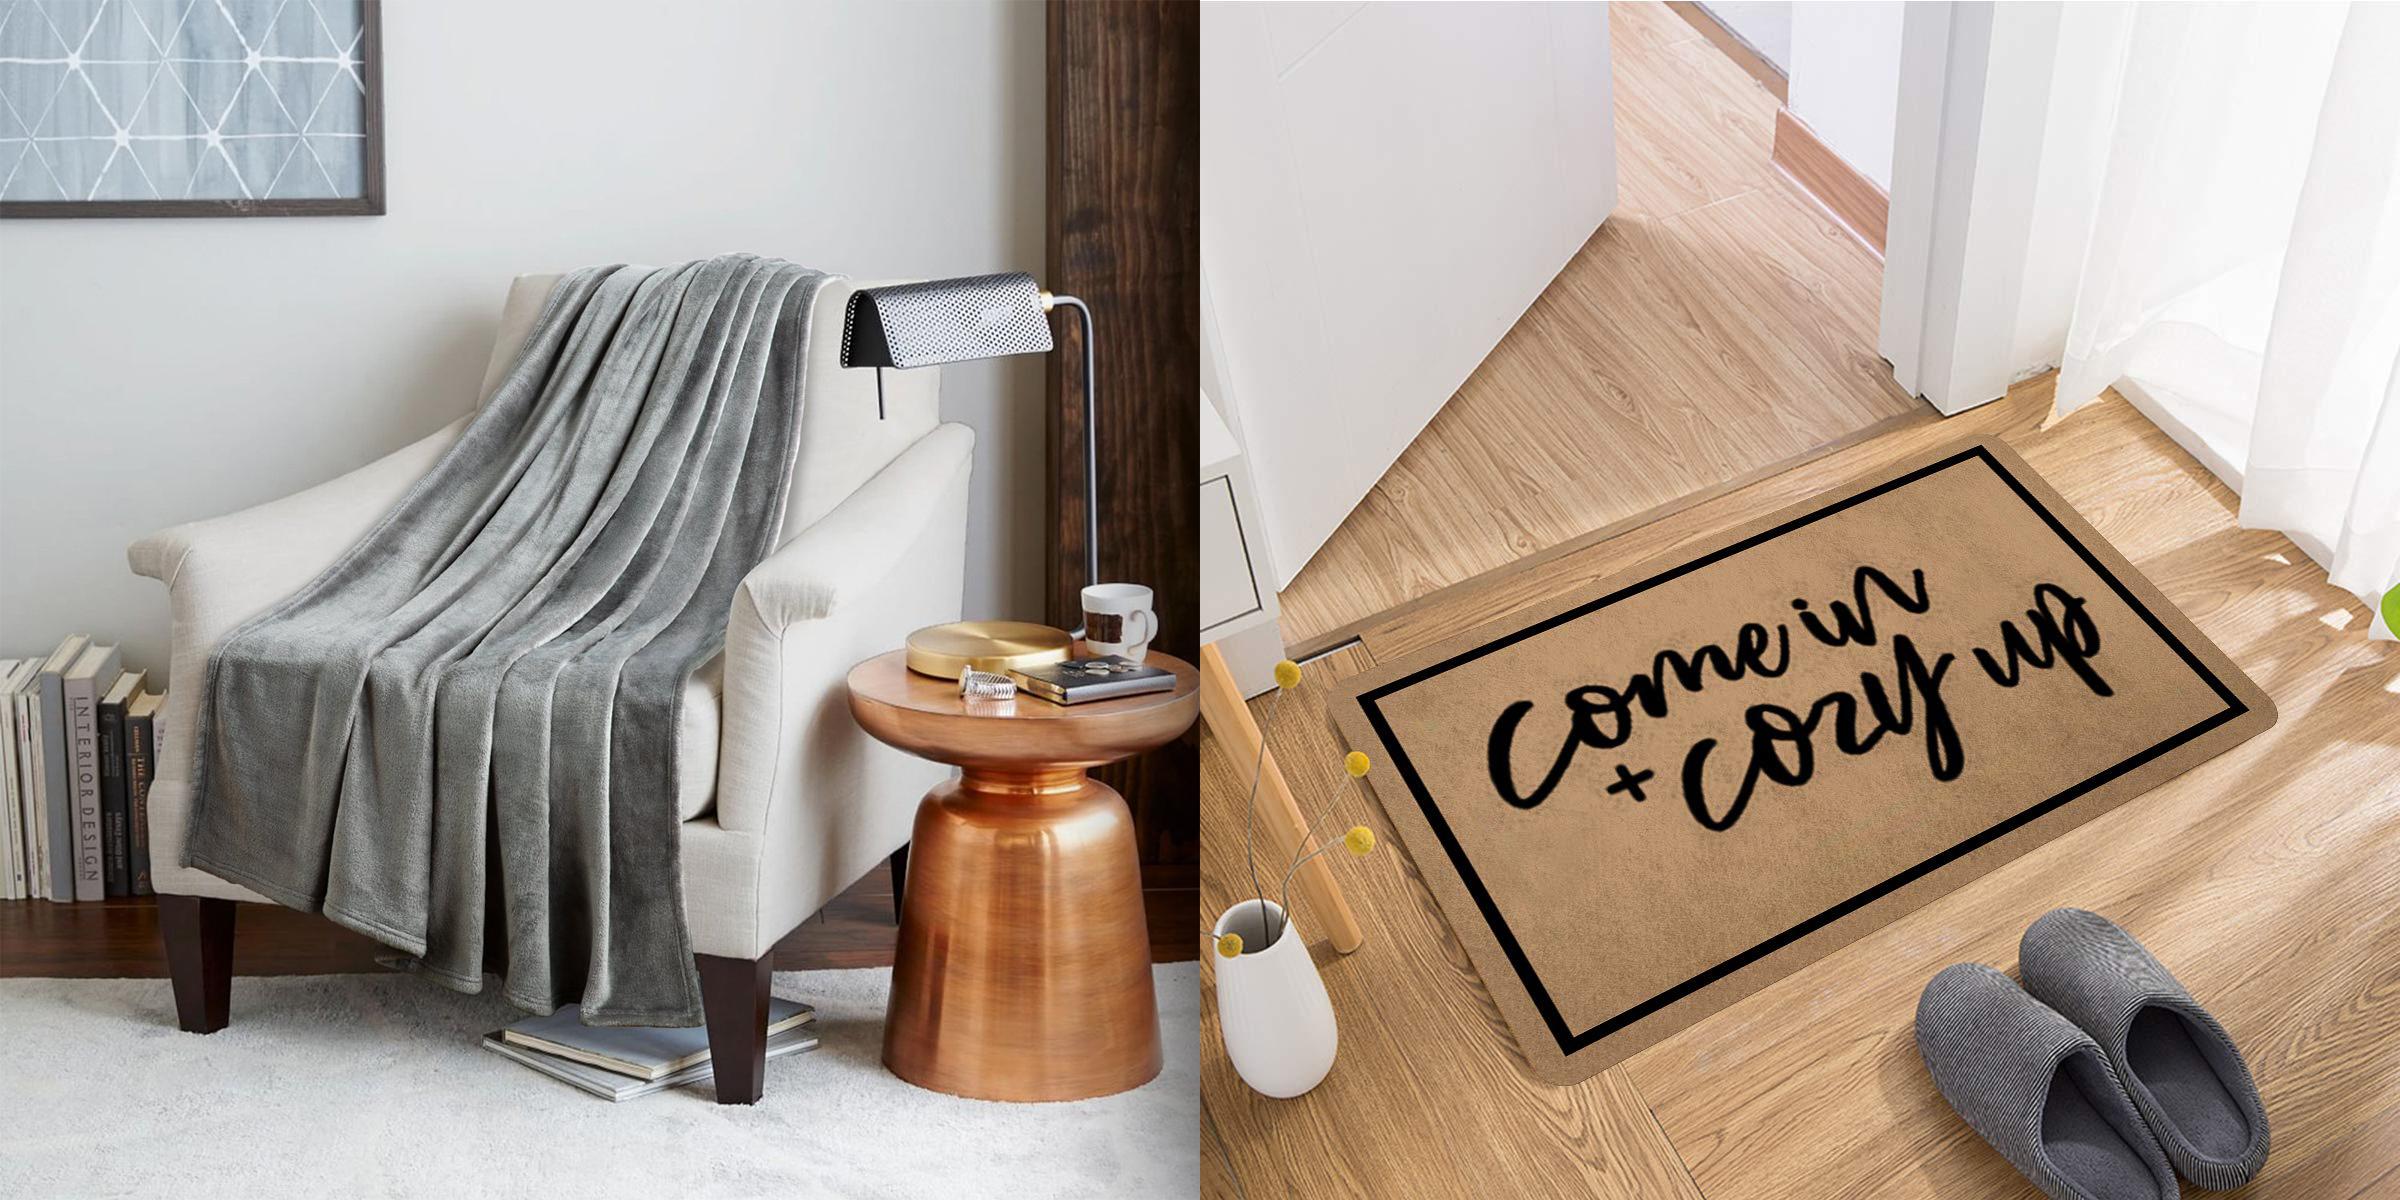 27 Cozy Living Room Items Under 50